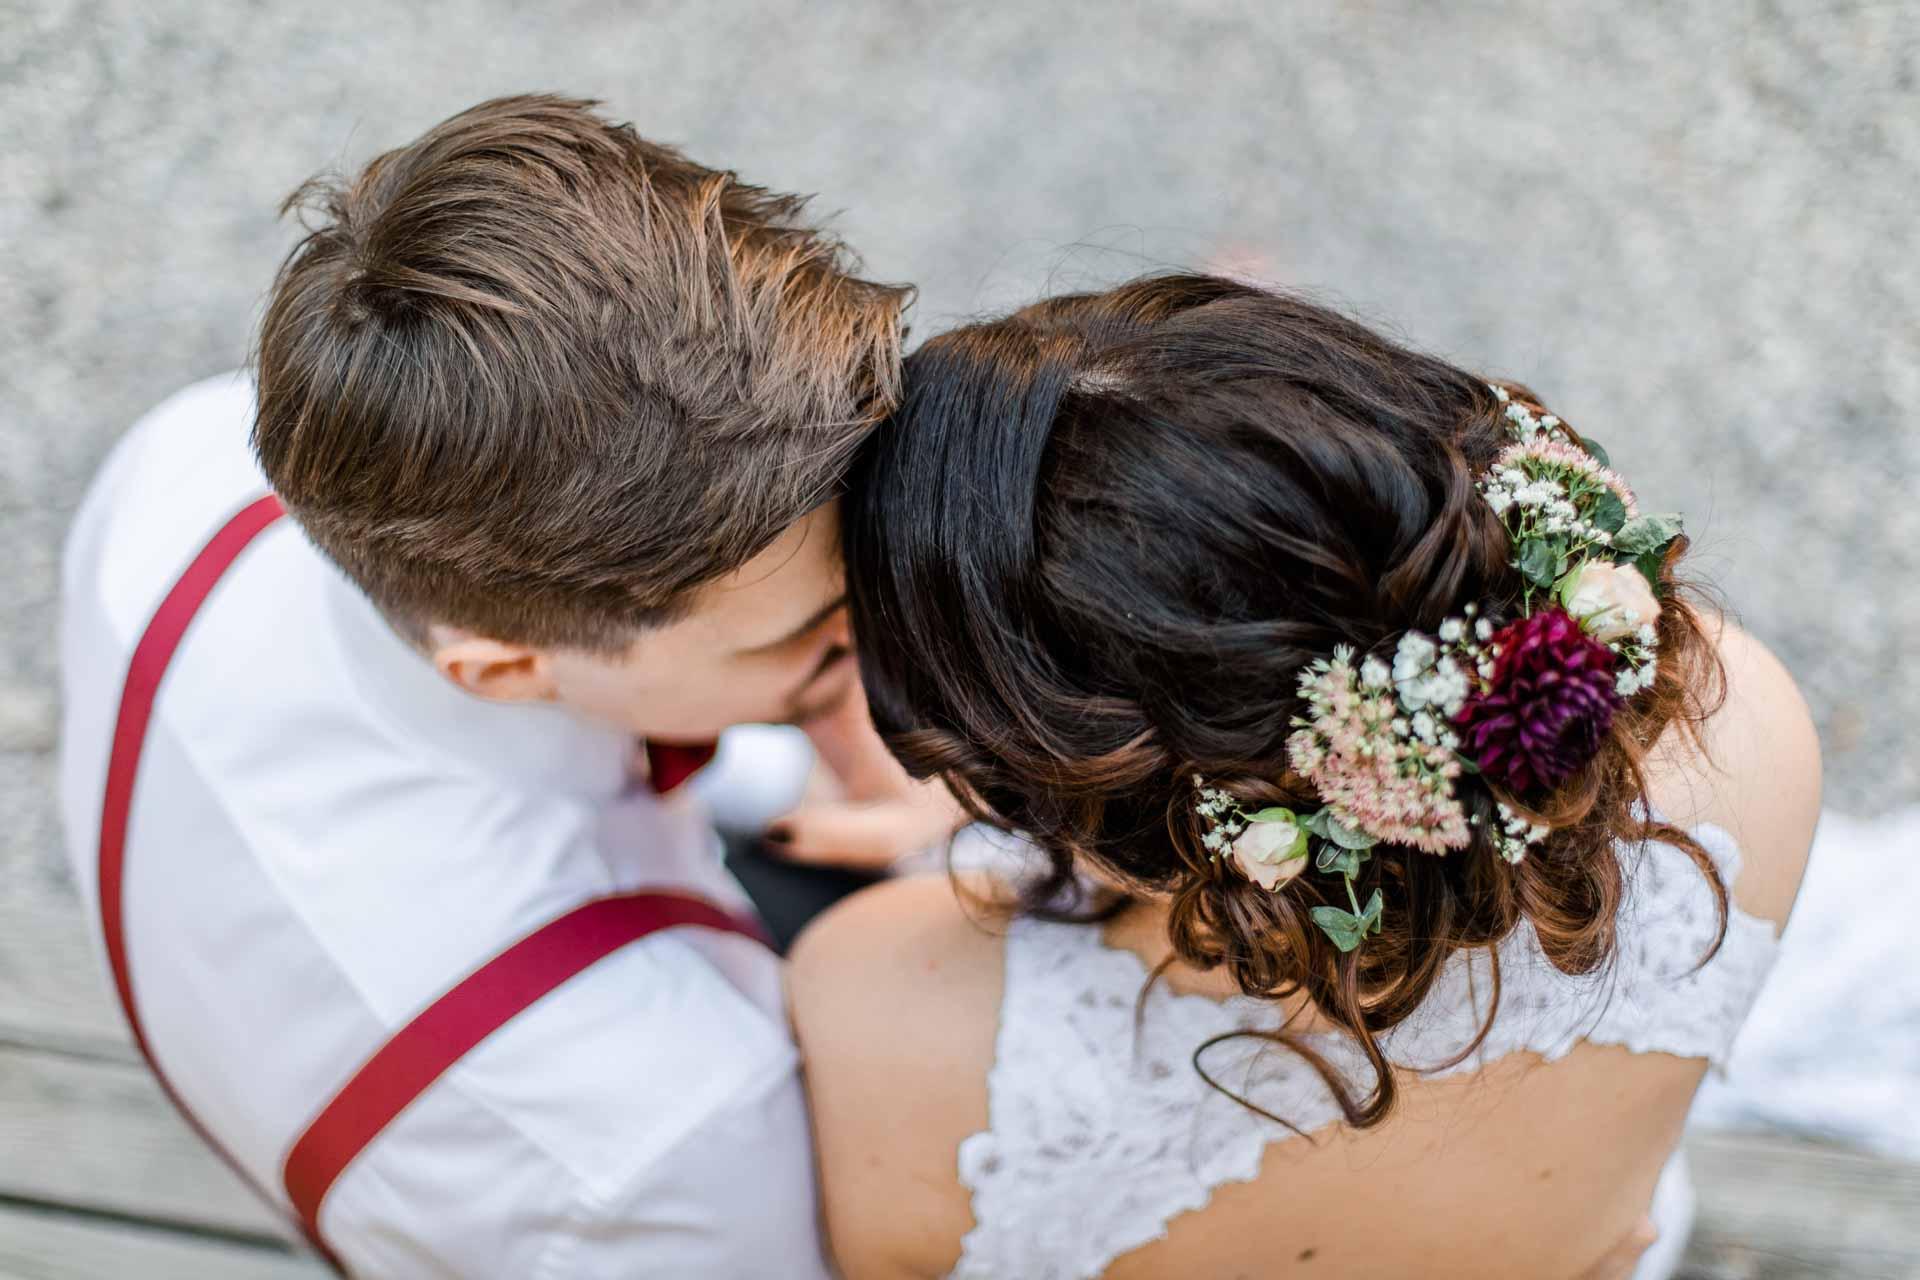 Himmelblau Rust Boho-Hochzeit Burgenland heiraten Boho Paarshooting